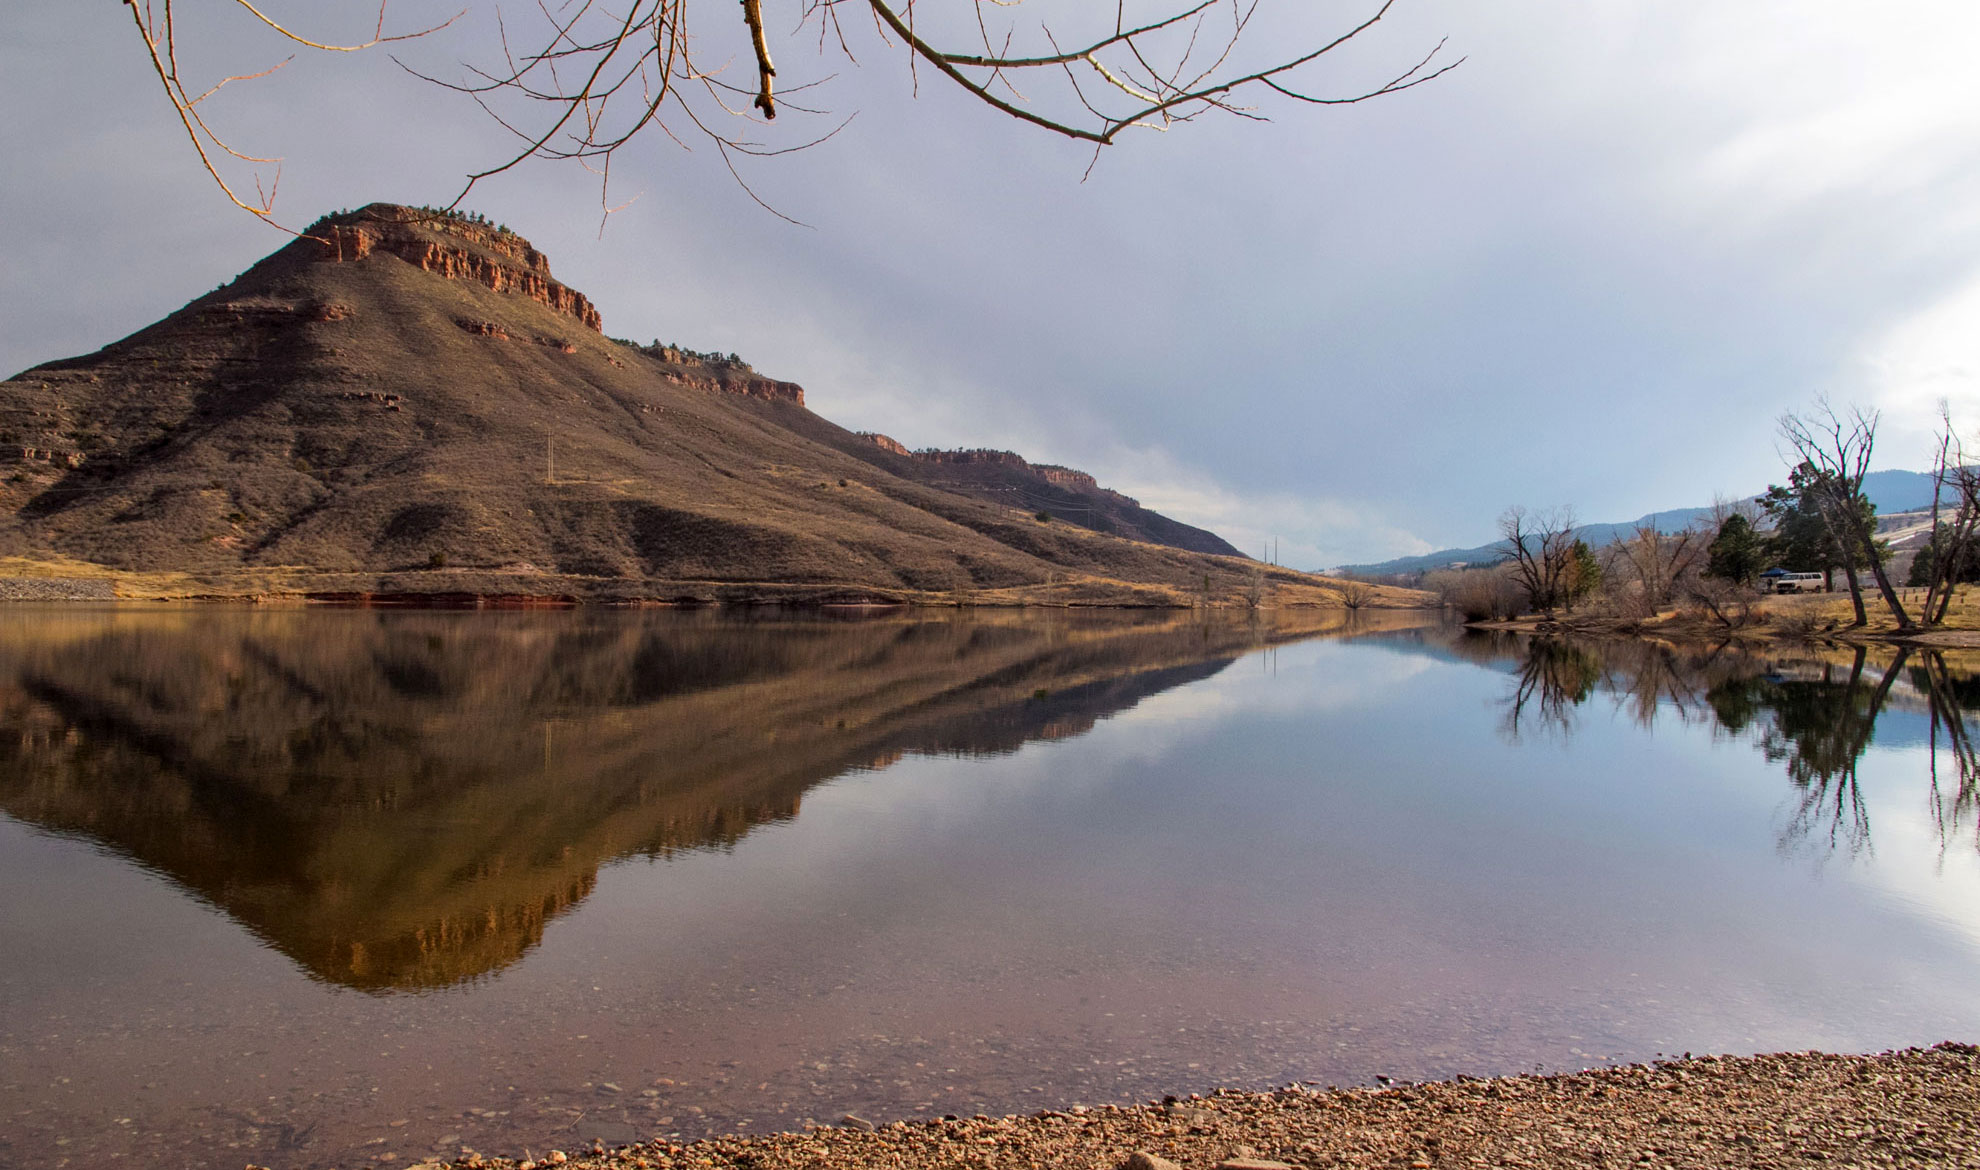 Image 1: Flatiron Reservoir